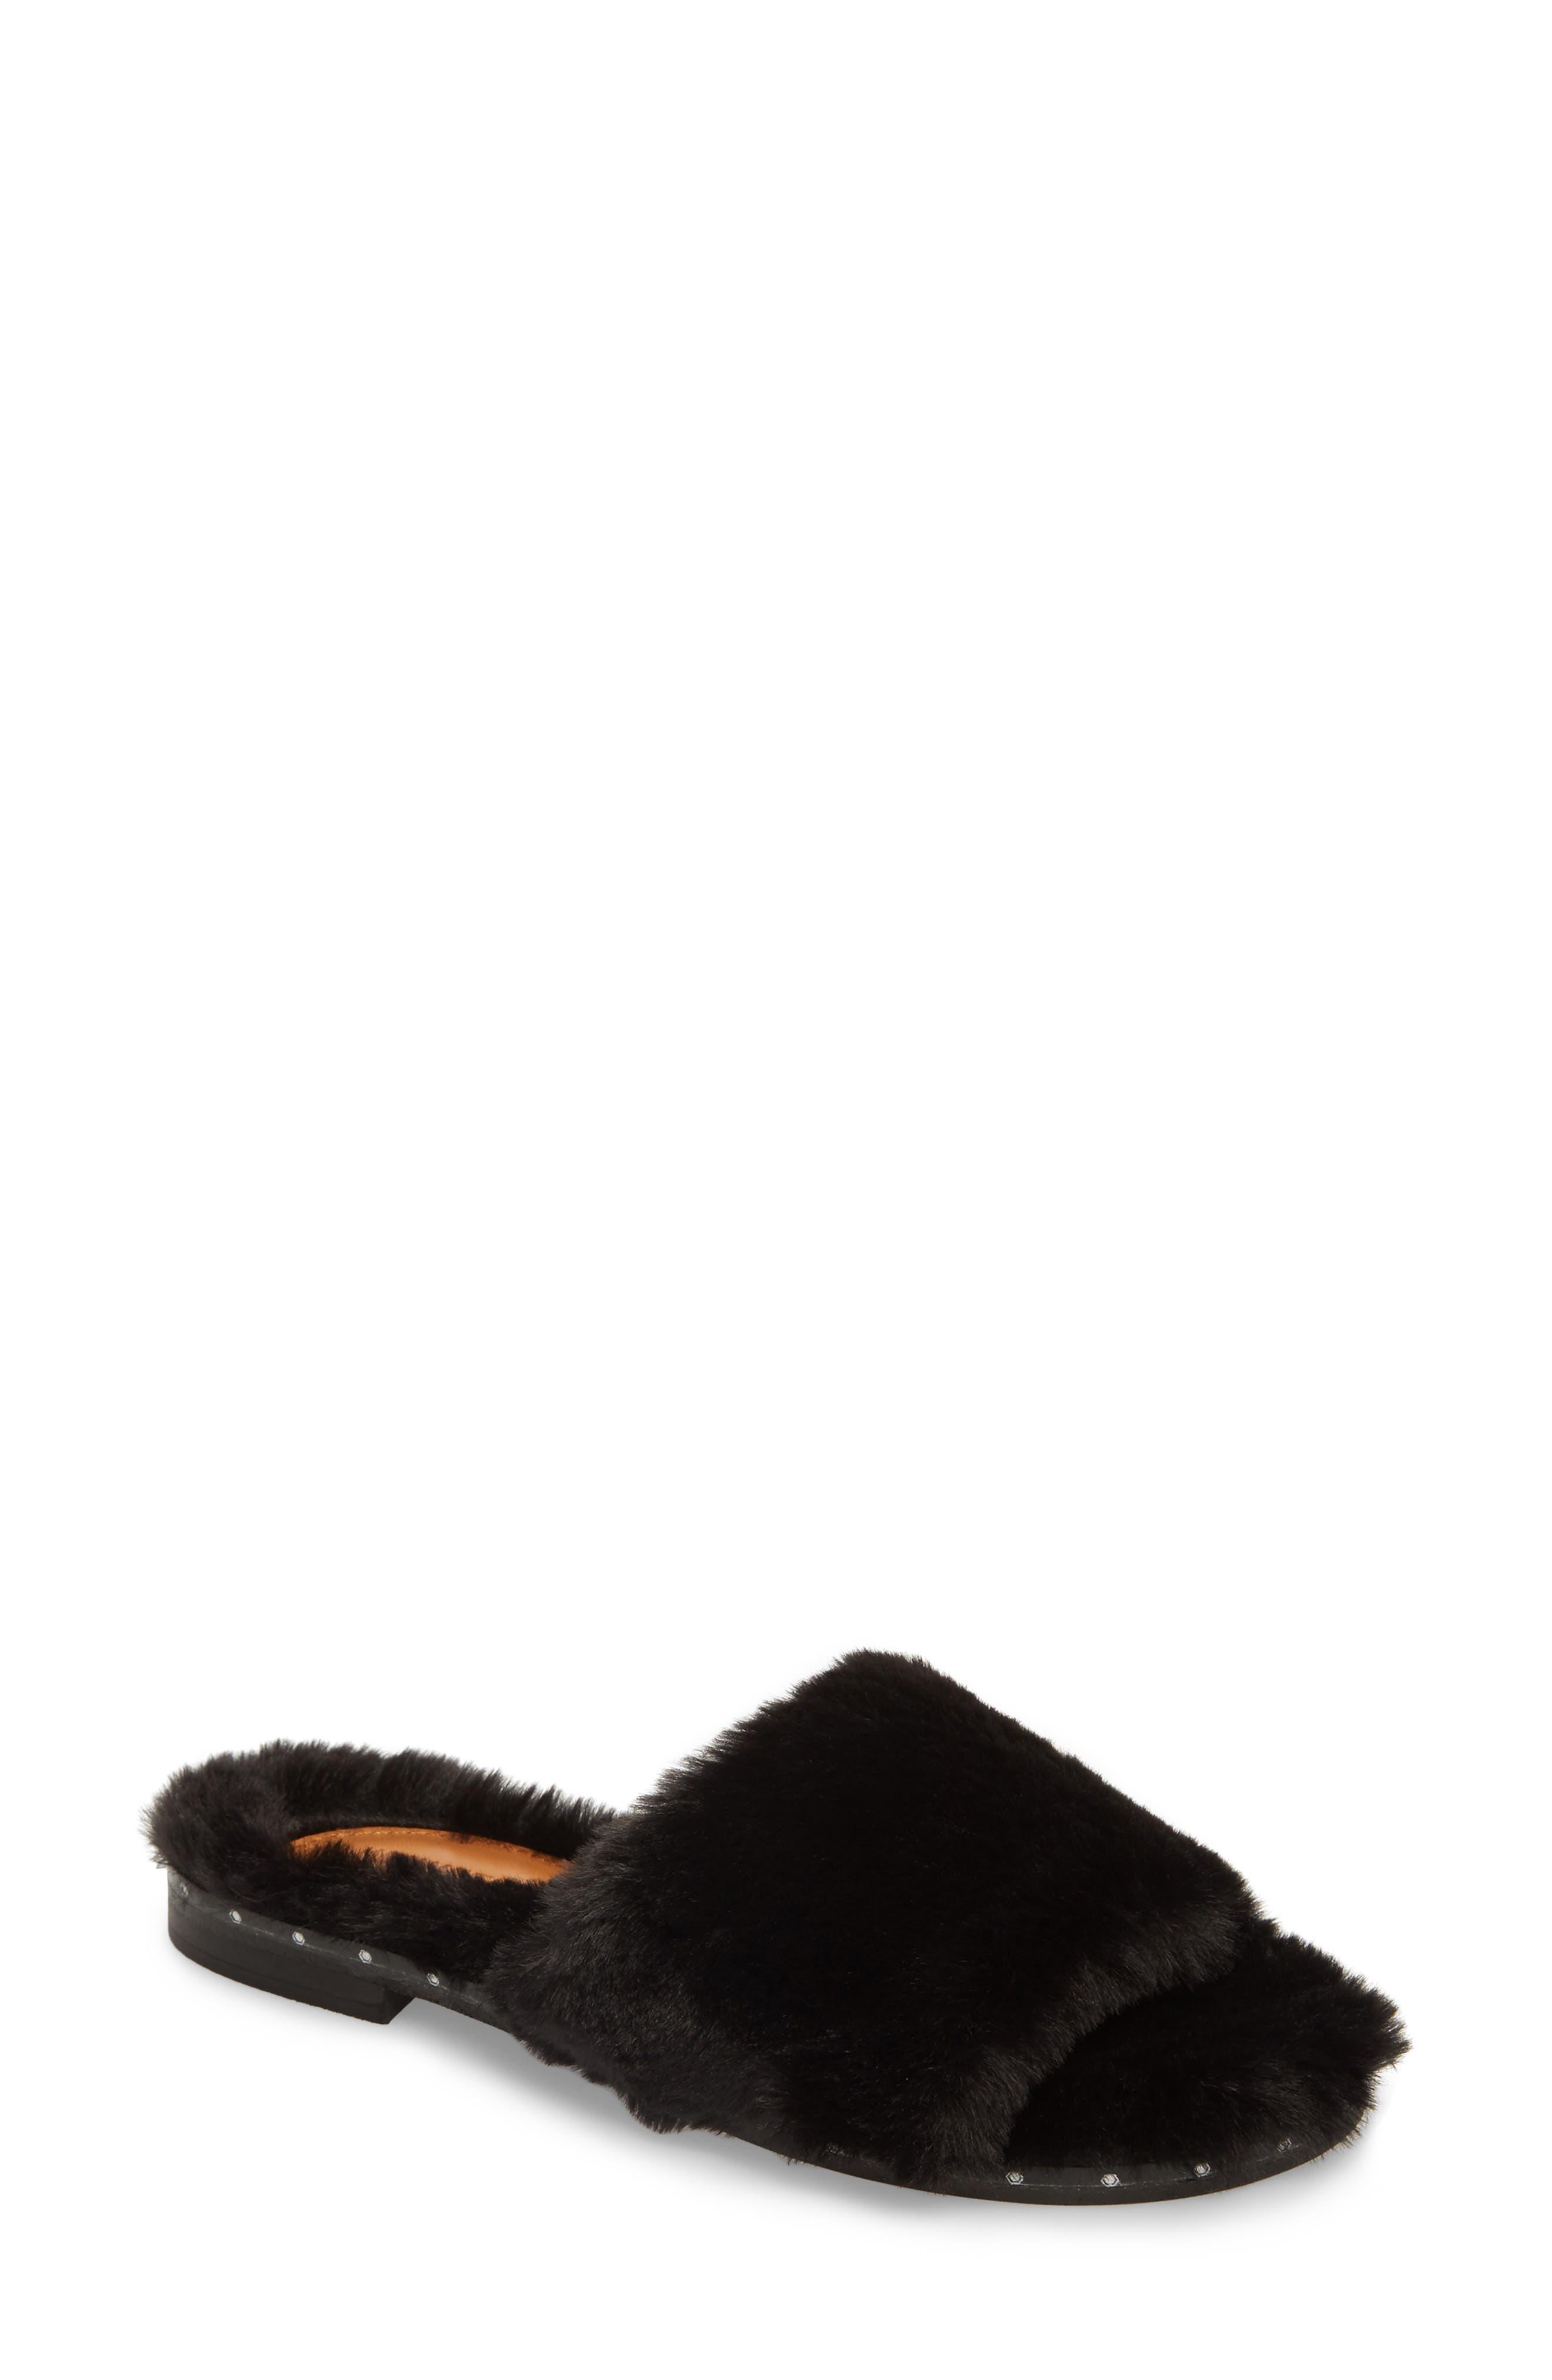 Alternate Image 1 Selected - Kenneth Cole New York Peggy Faux Fur Slide Sandal (Women)